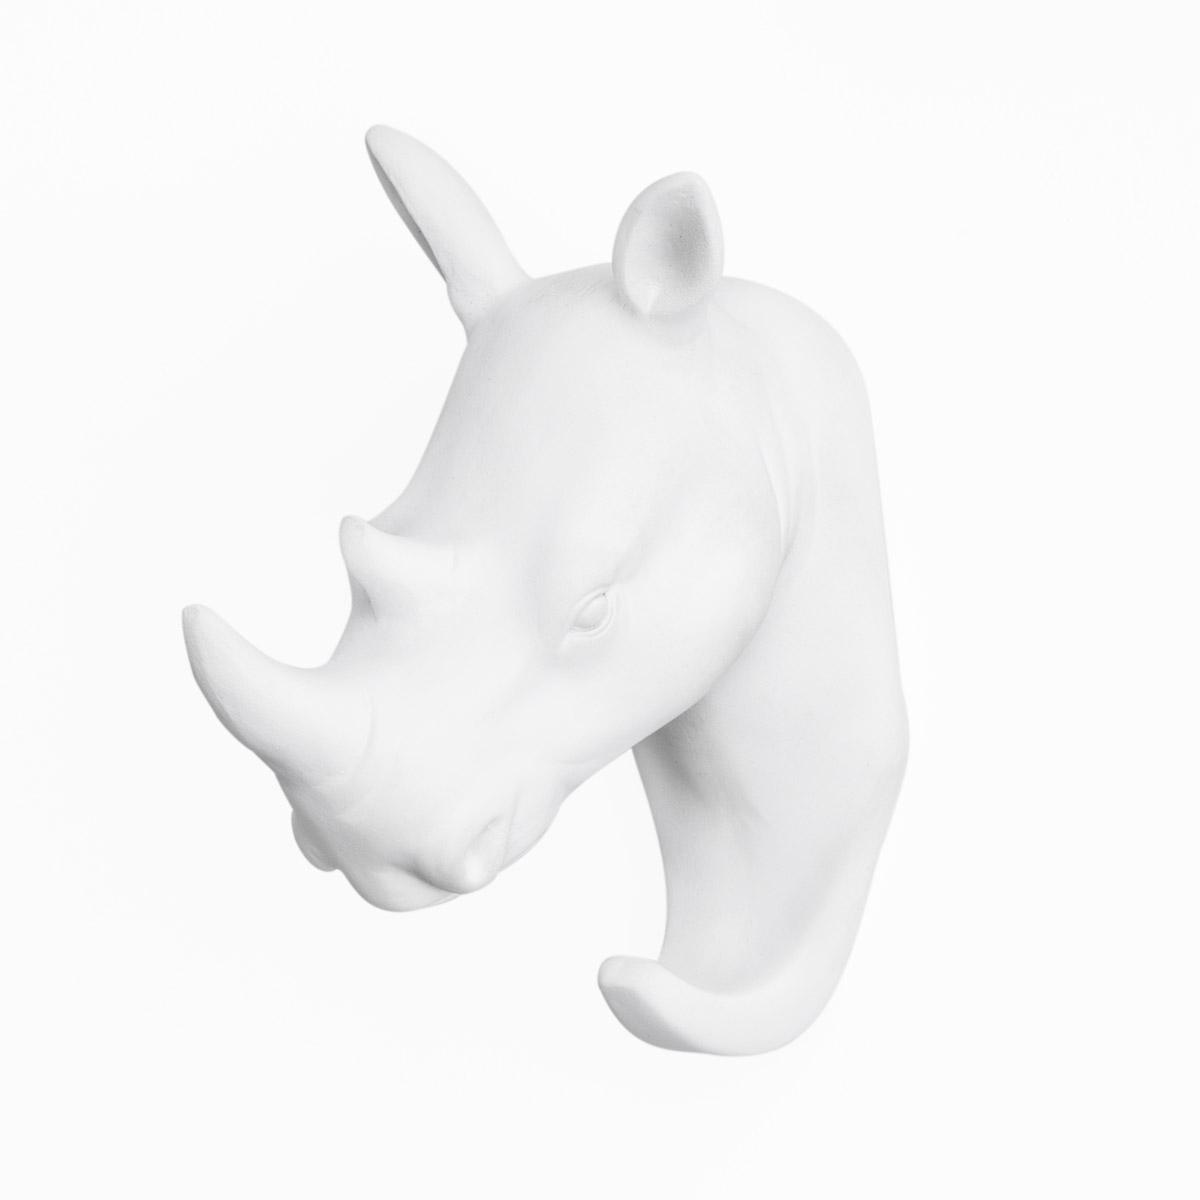 Colgador Rhino, poliresina, color blanco, figura decorativa,10x5x11 cm